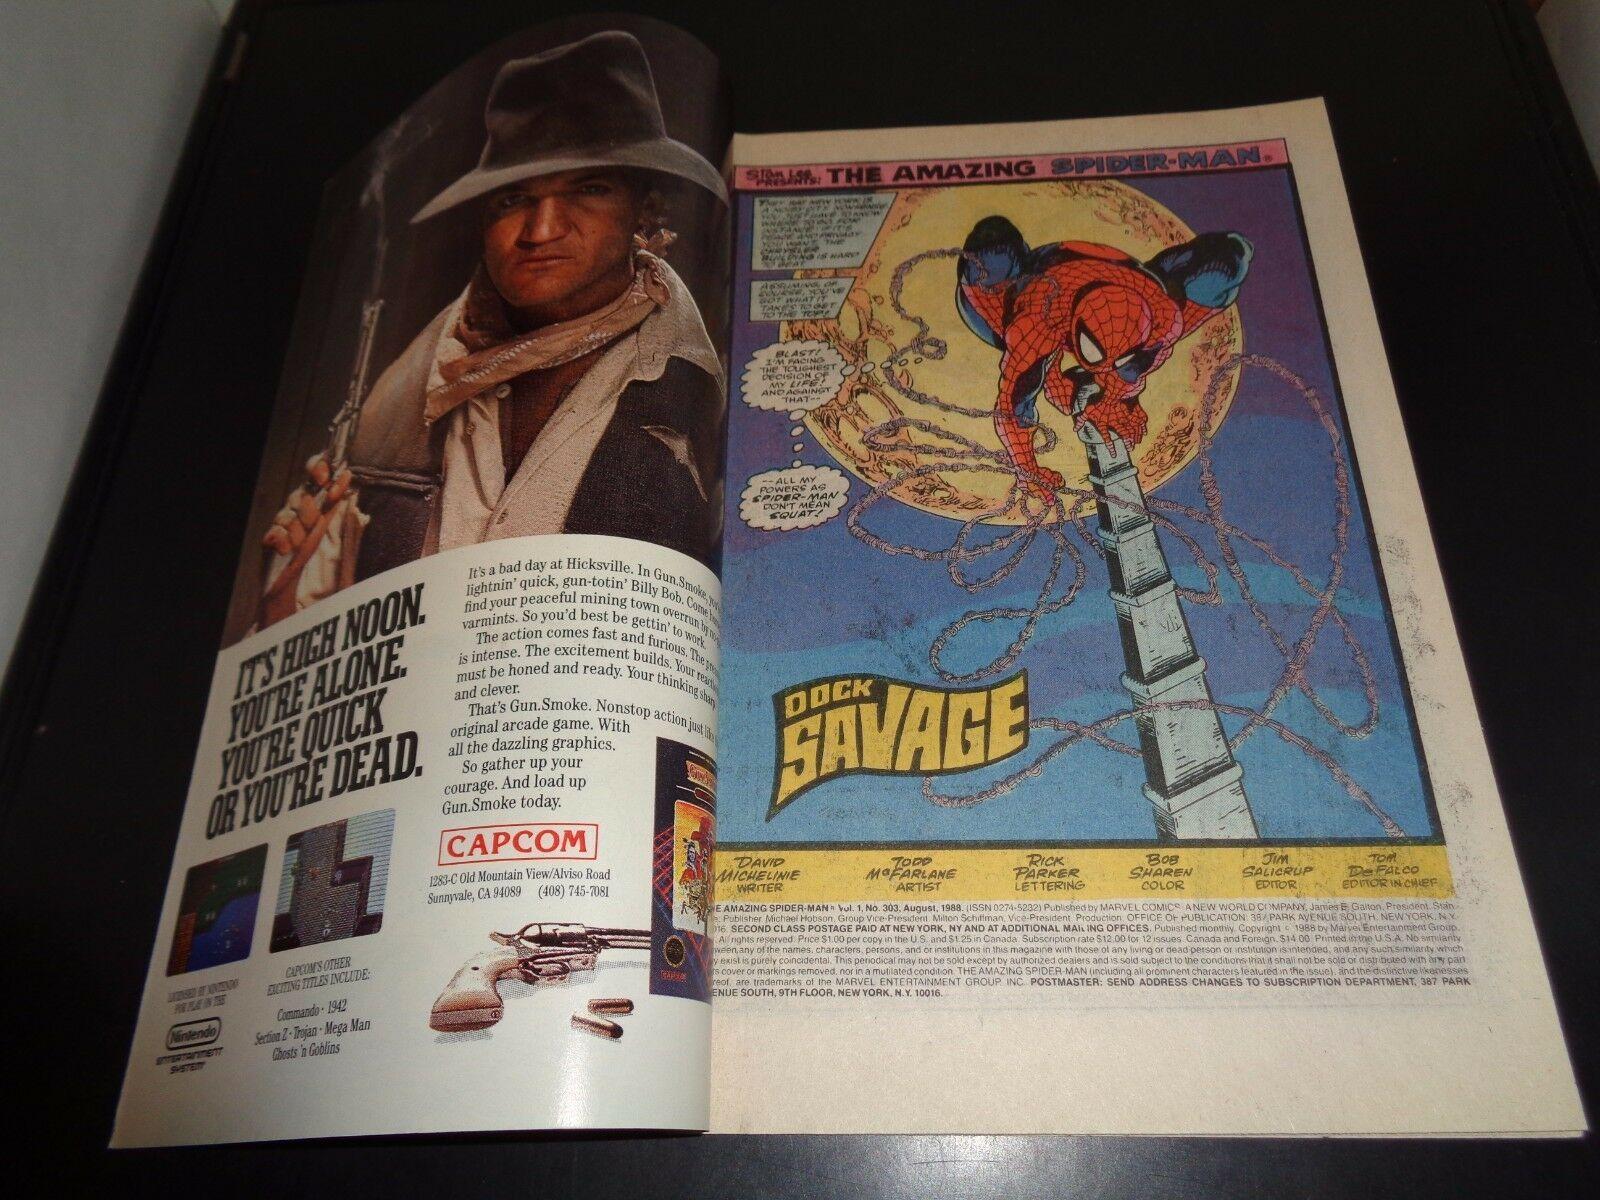 Amazing Spider-Man #303 Marvel Comic Book NM (9.0) Condition 1988 Todd McFarlane